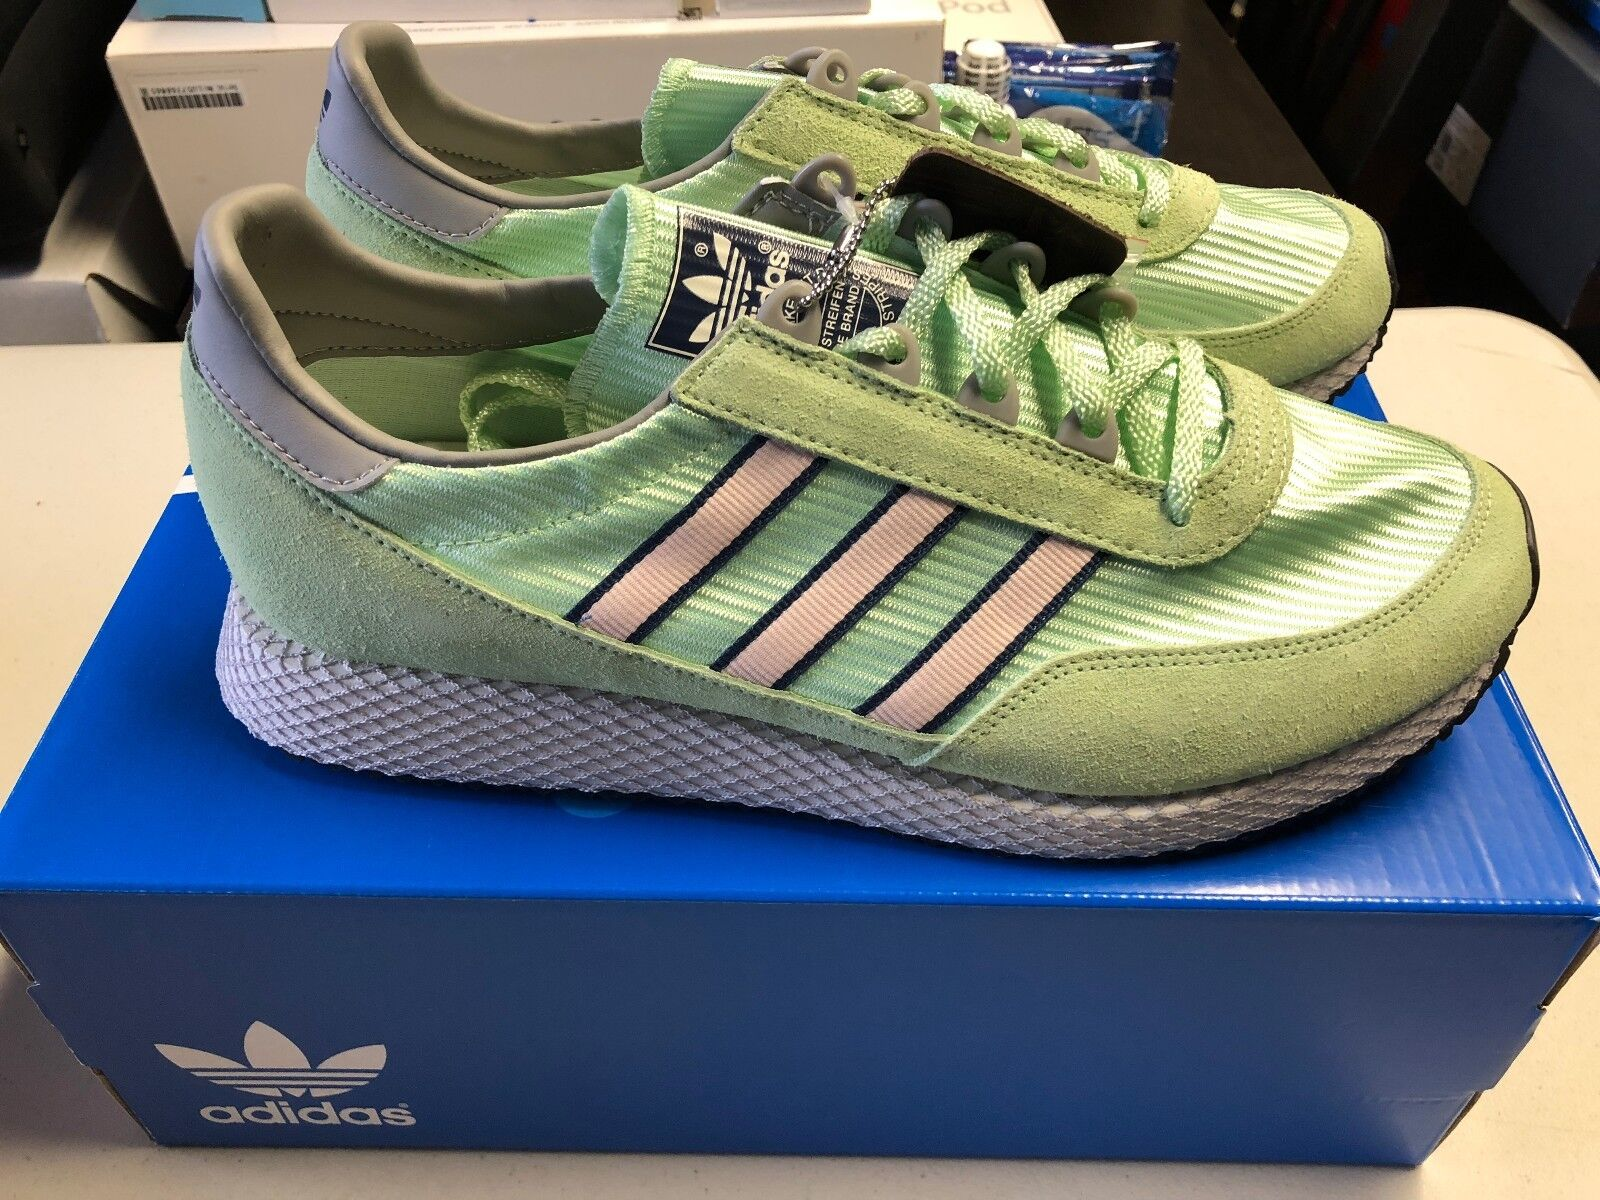 Nuove adidas glenbuck spzl spezial dimensioni giada 10,5 nebbia verde giada dimensioni lcey rosa da8759 pennino bd3f99